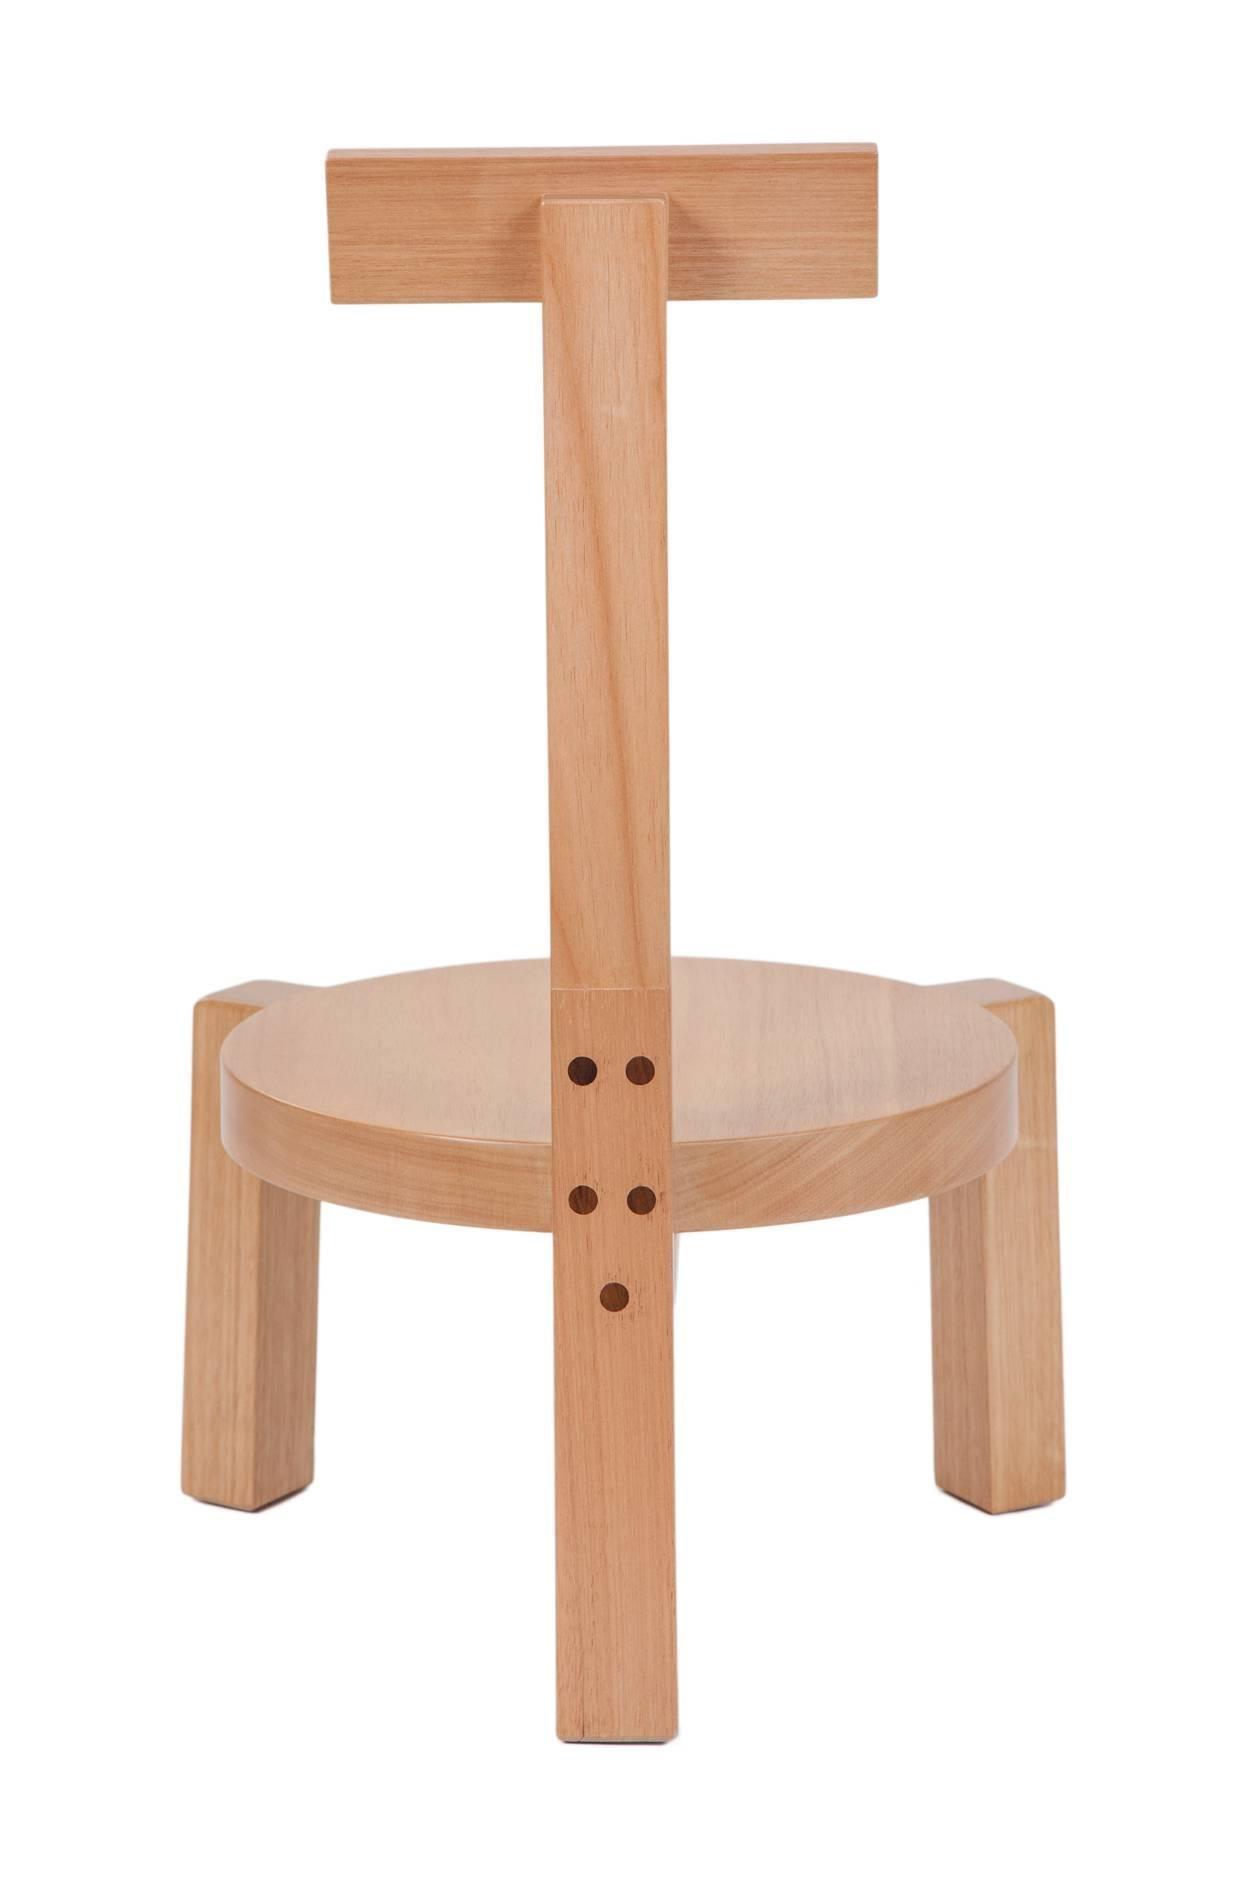 handmade wooden chairs swing chair uk girafa short modern brazilian design of solid wood woodwork for sale